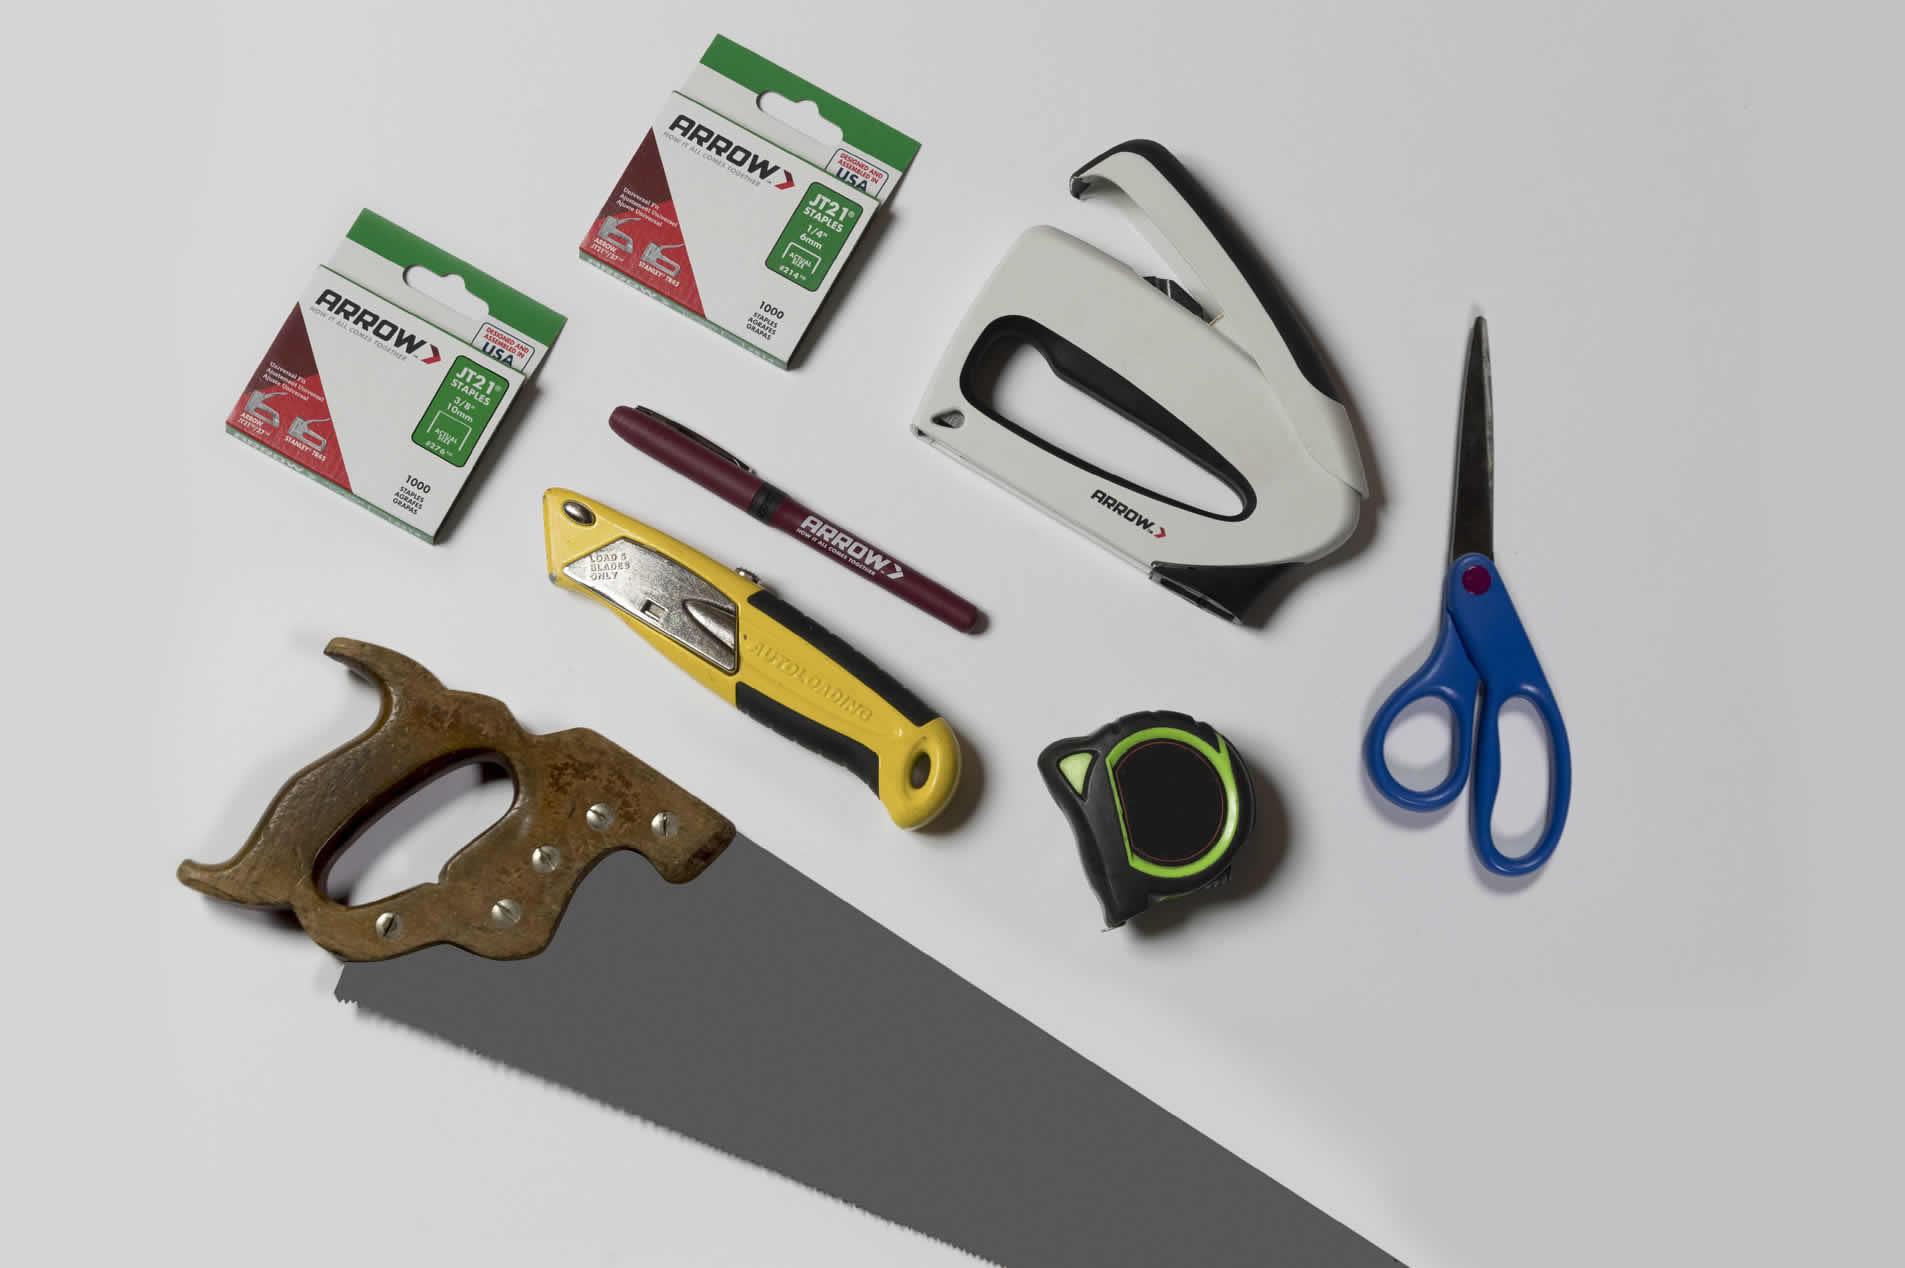 Arrow TT21 TruTac staple gun, JT21 staples and other tools